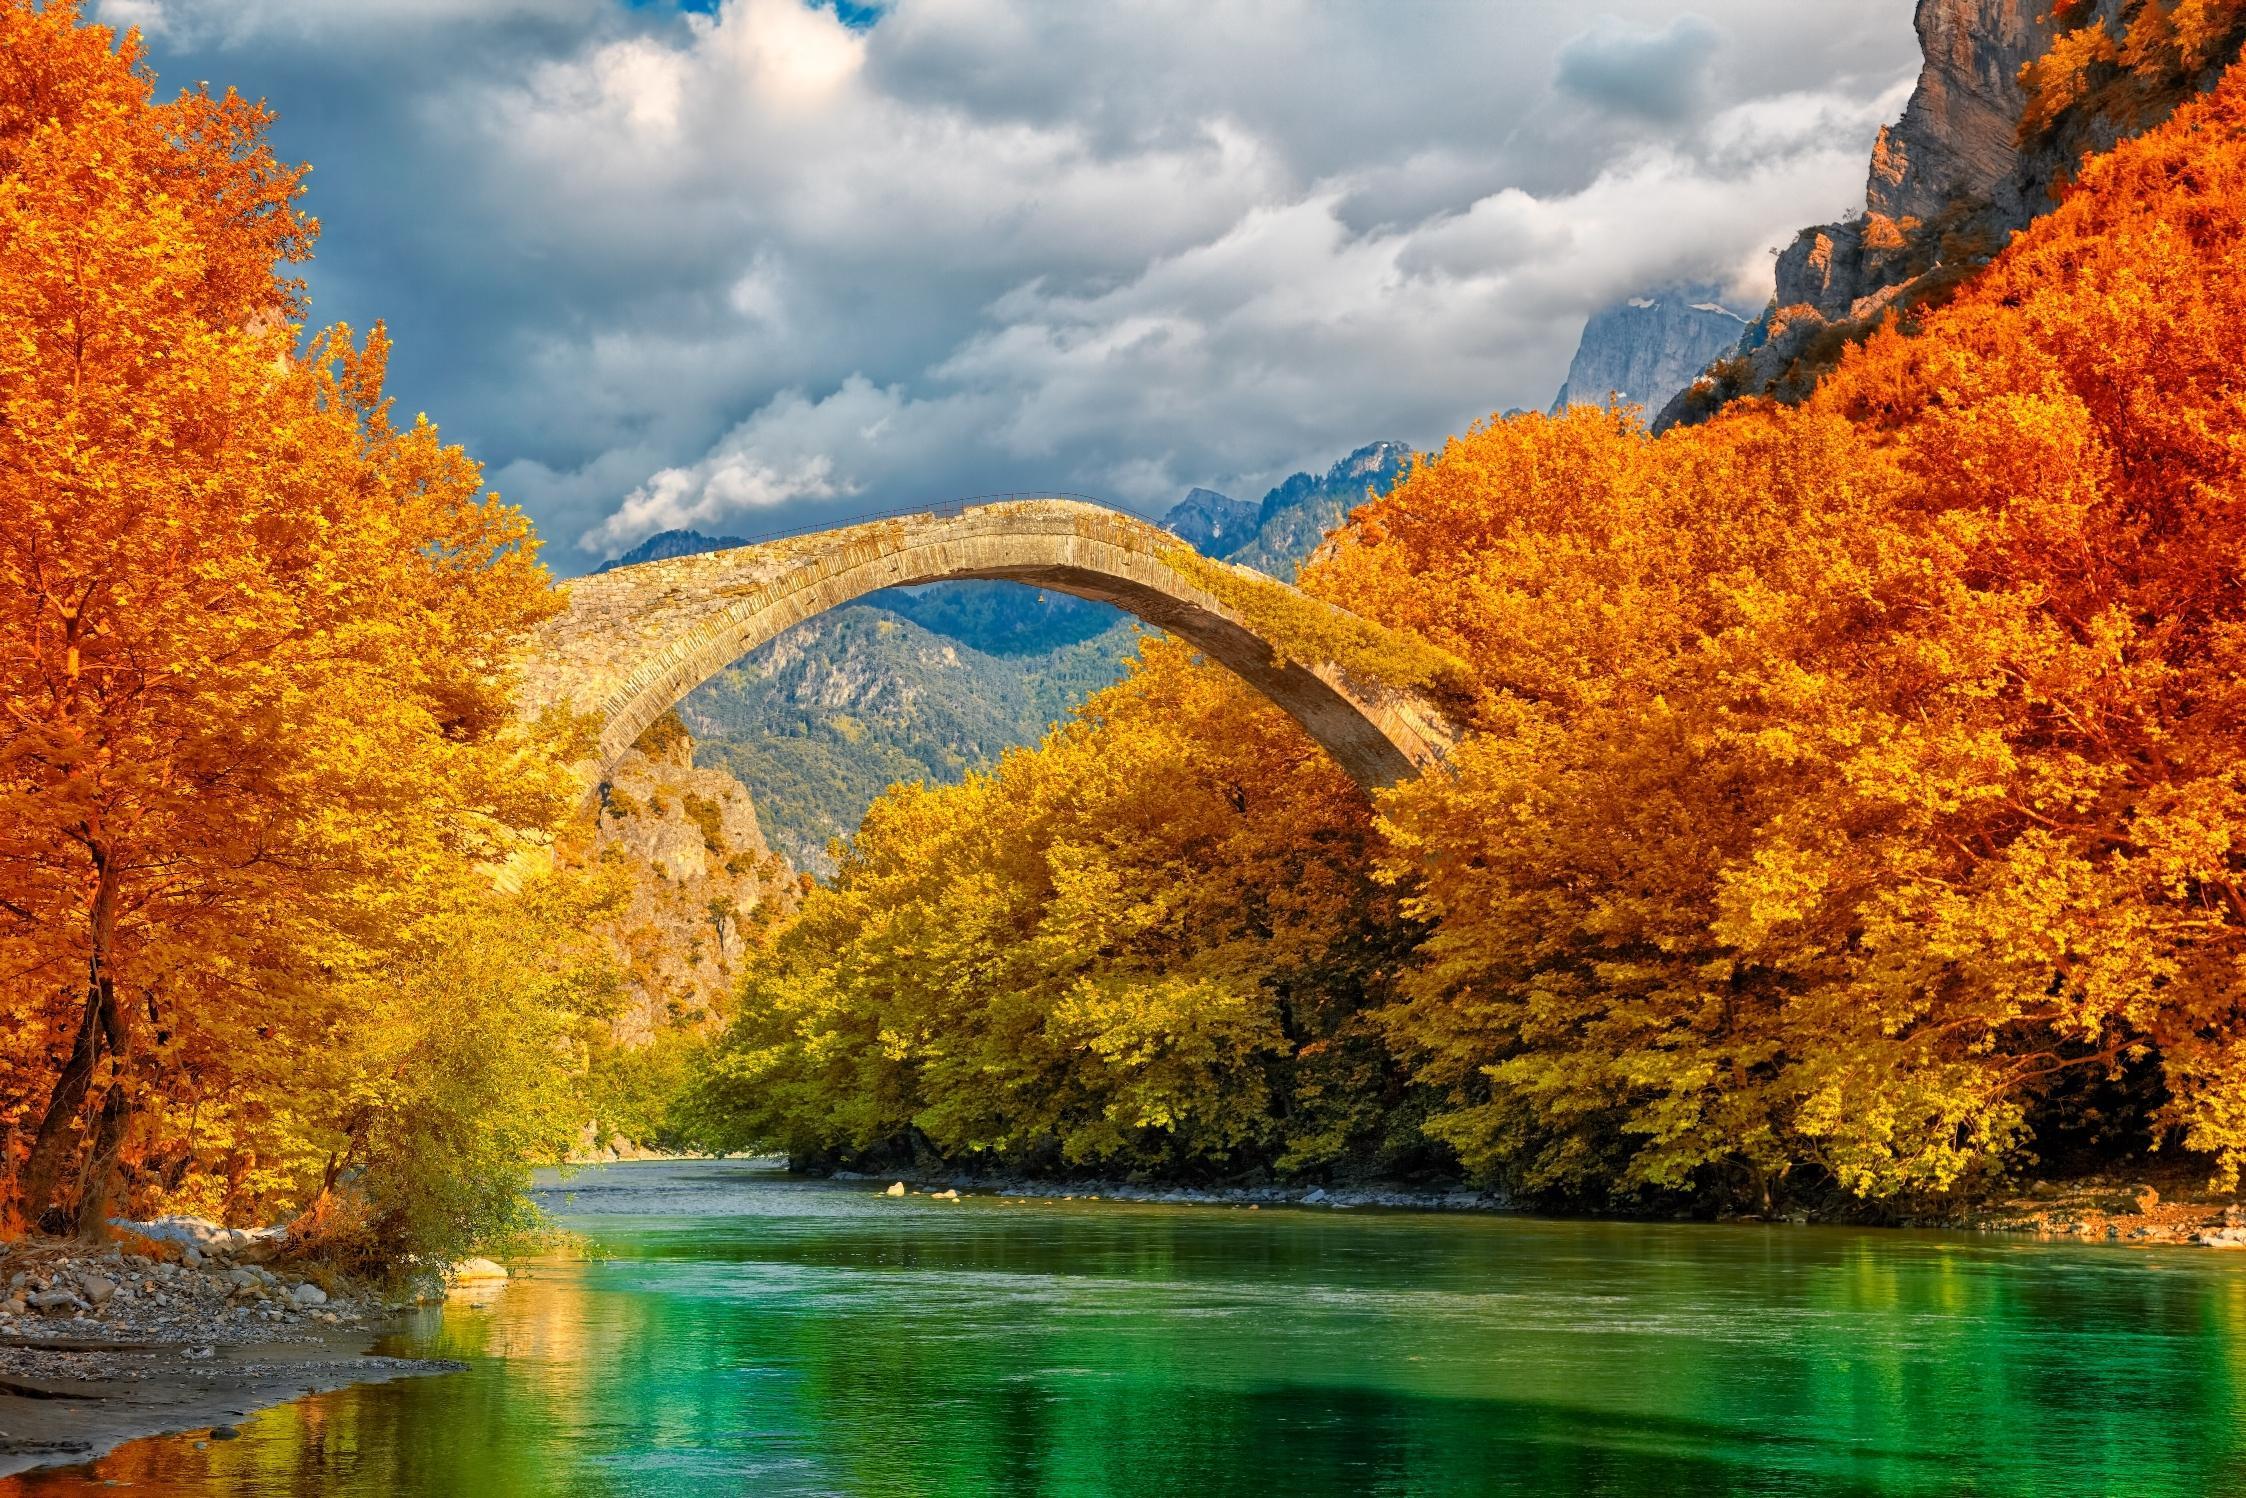 Bridge, Aoos River, Greece, Dance of colours, Marios Karlaftis, Nicolas Sterling, nicolassterling, ns_spans, spans, spansassociates.jpeg